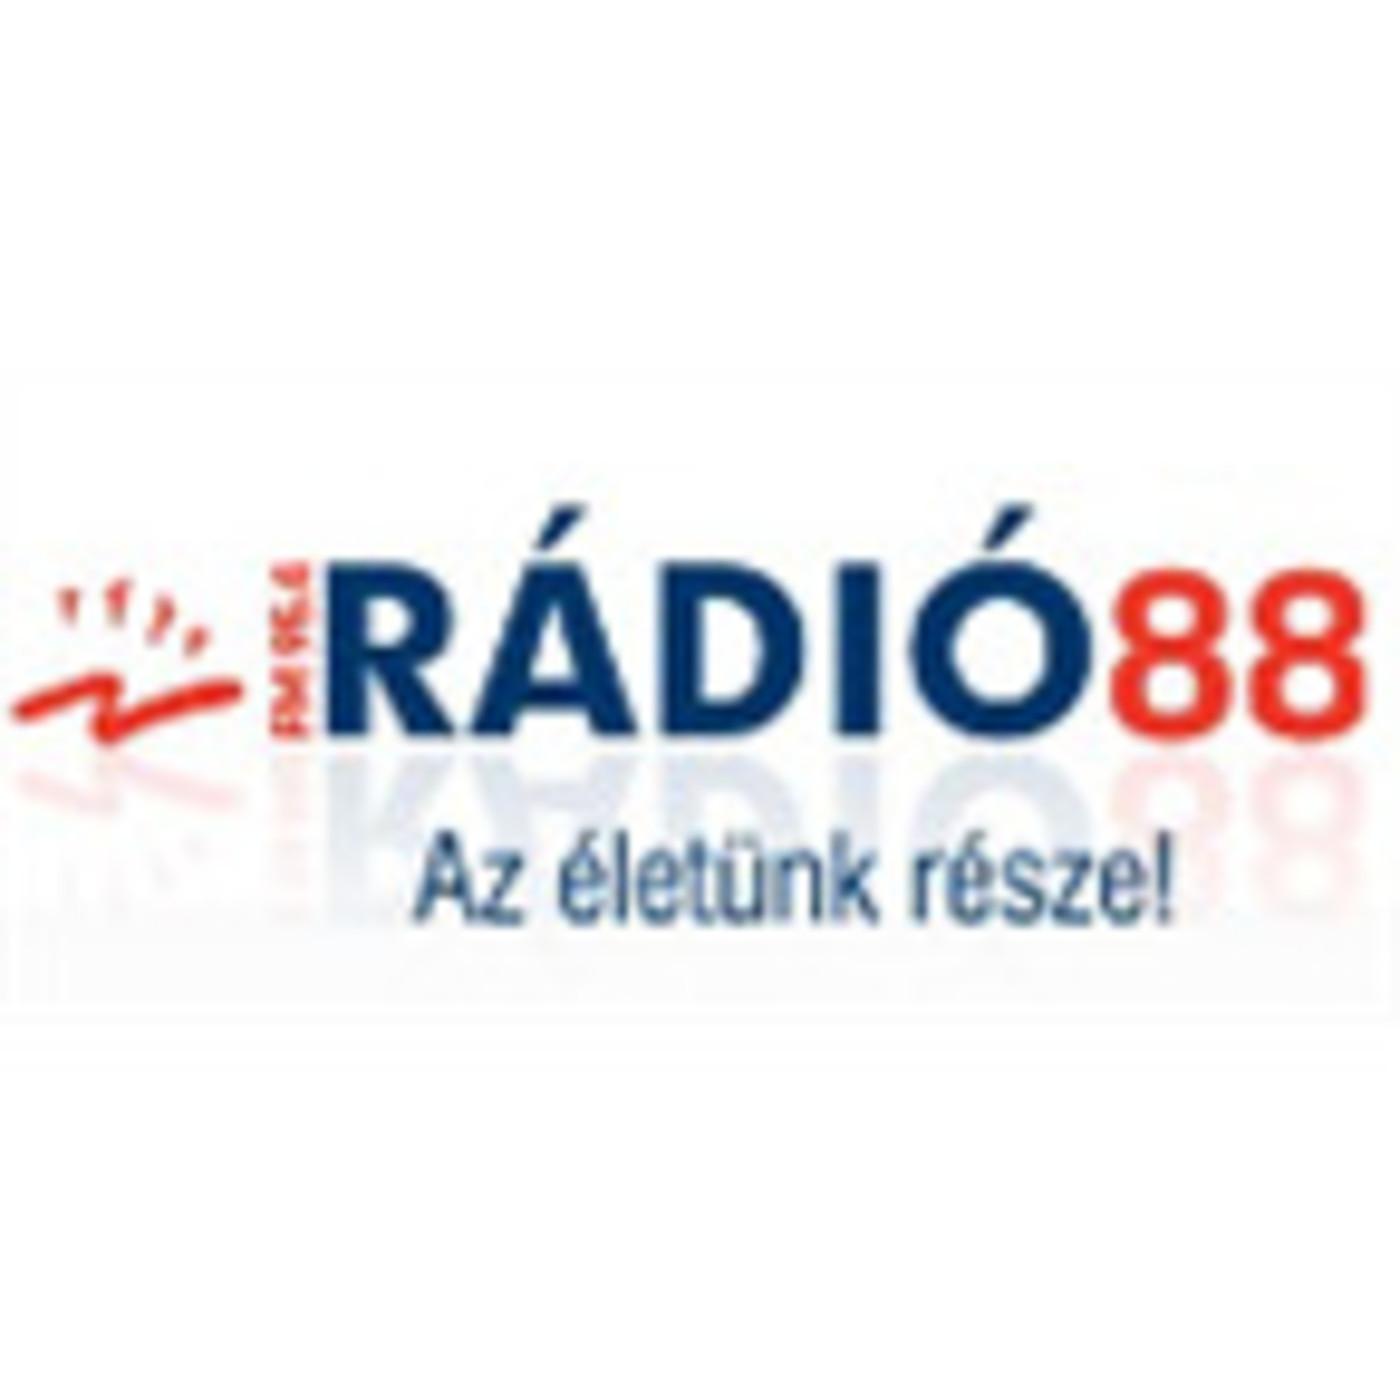 Radio 88 - Club 88